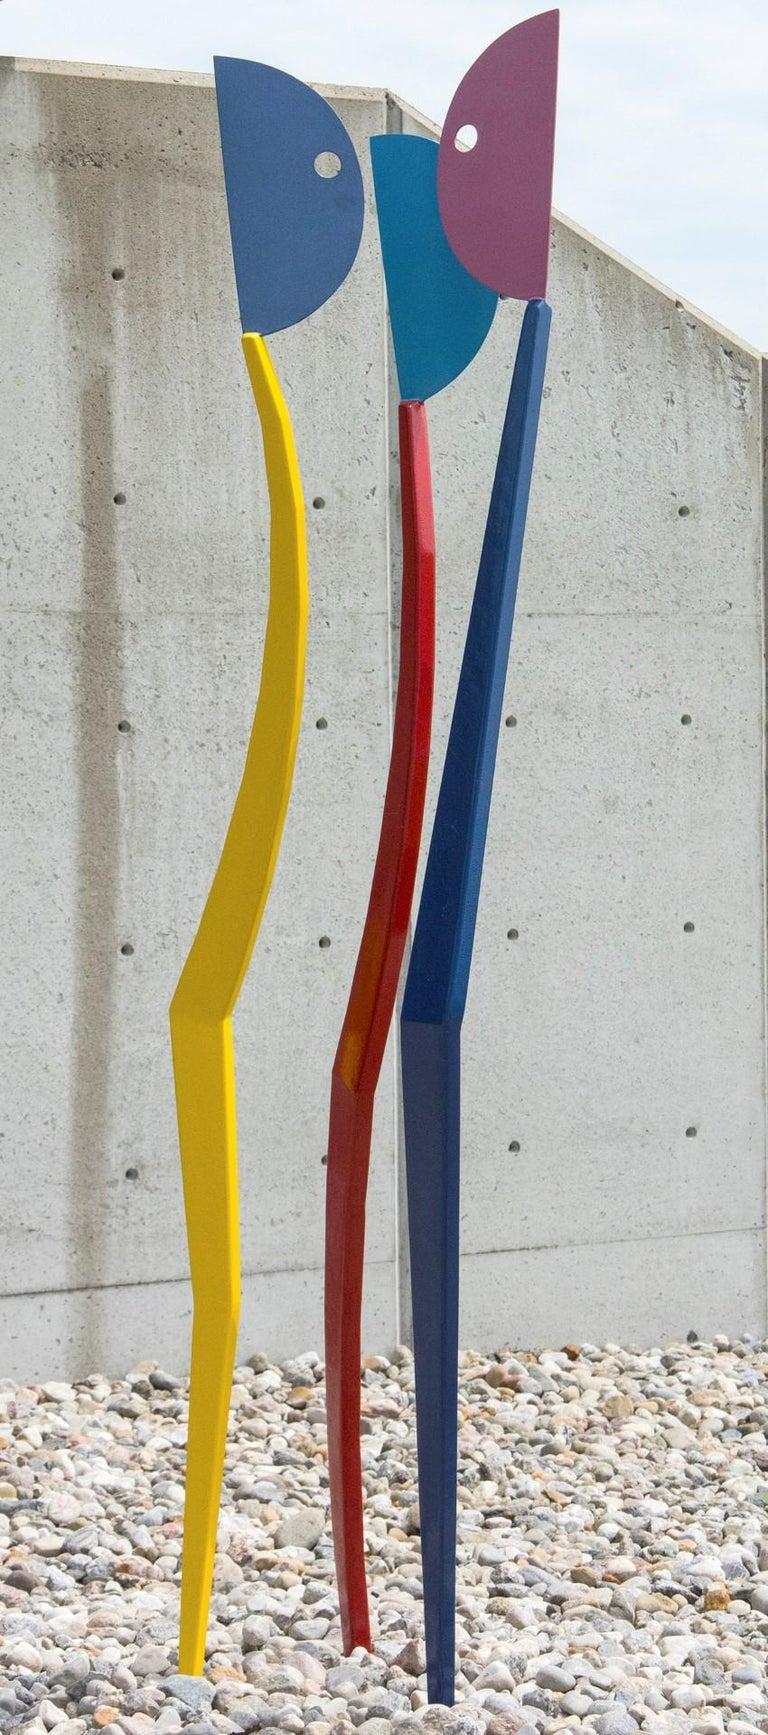 Interloper - Blue Figurative Sculpture by R. Clark Ellis